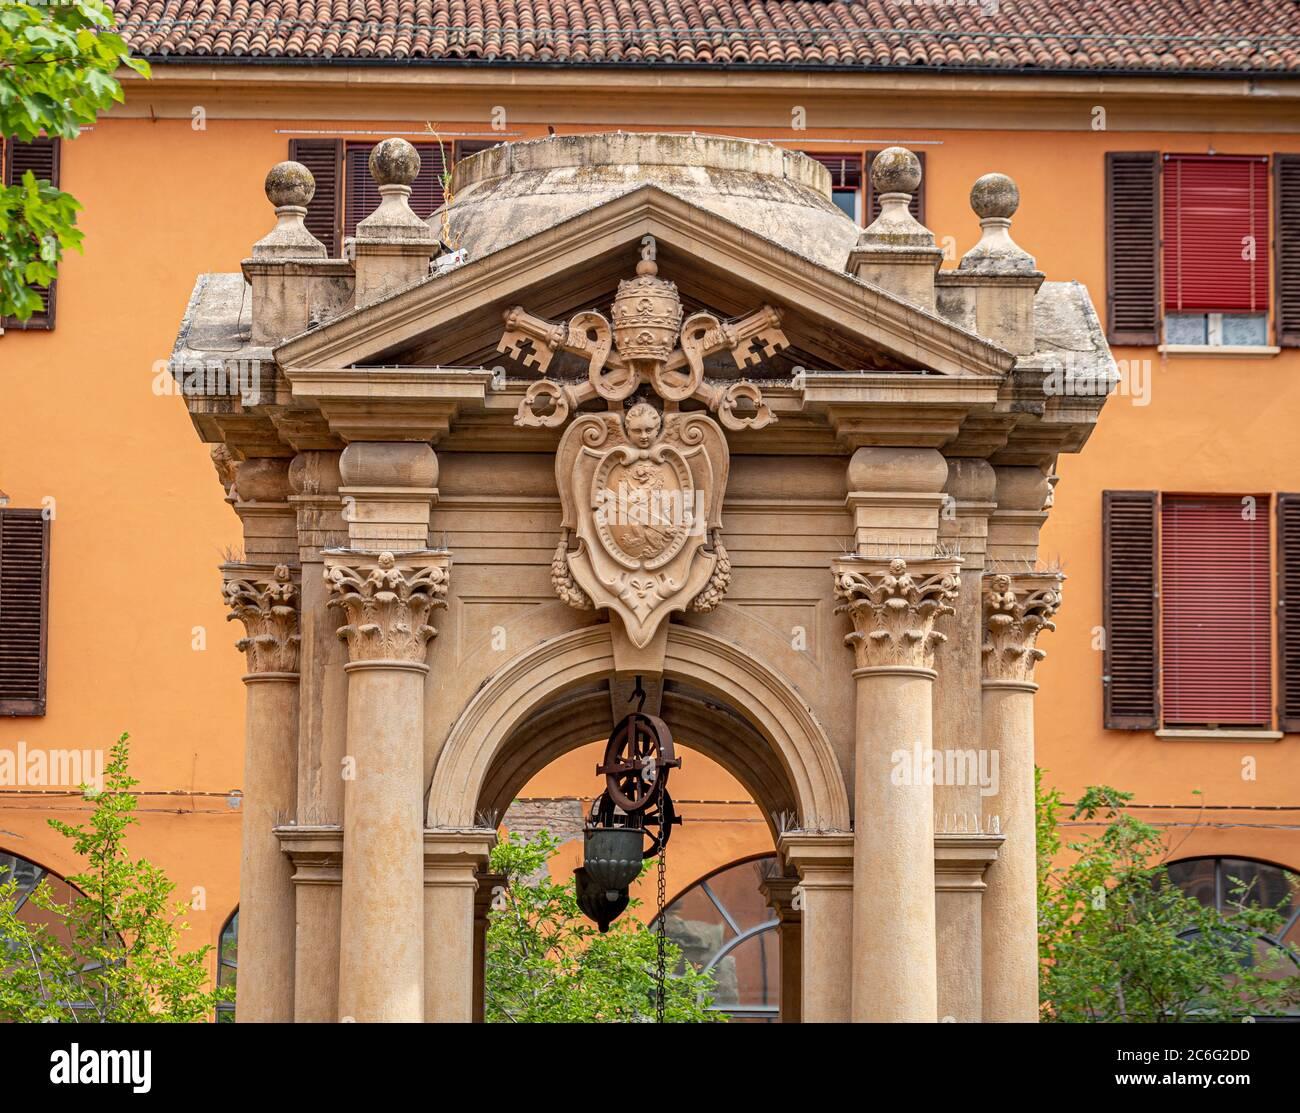 Pozzo dei desideri. Wishing well in the courtyard of Palazzo Comunale. Bologna, Italy. Stock Photo